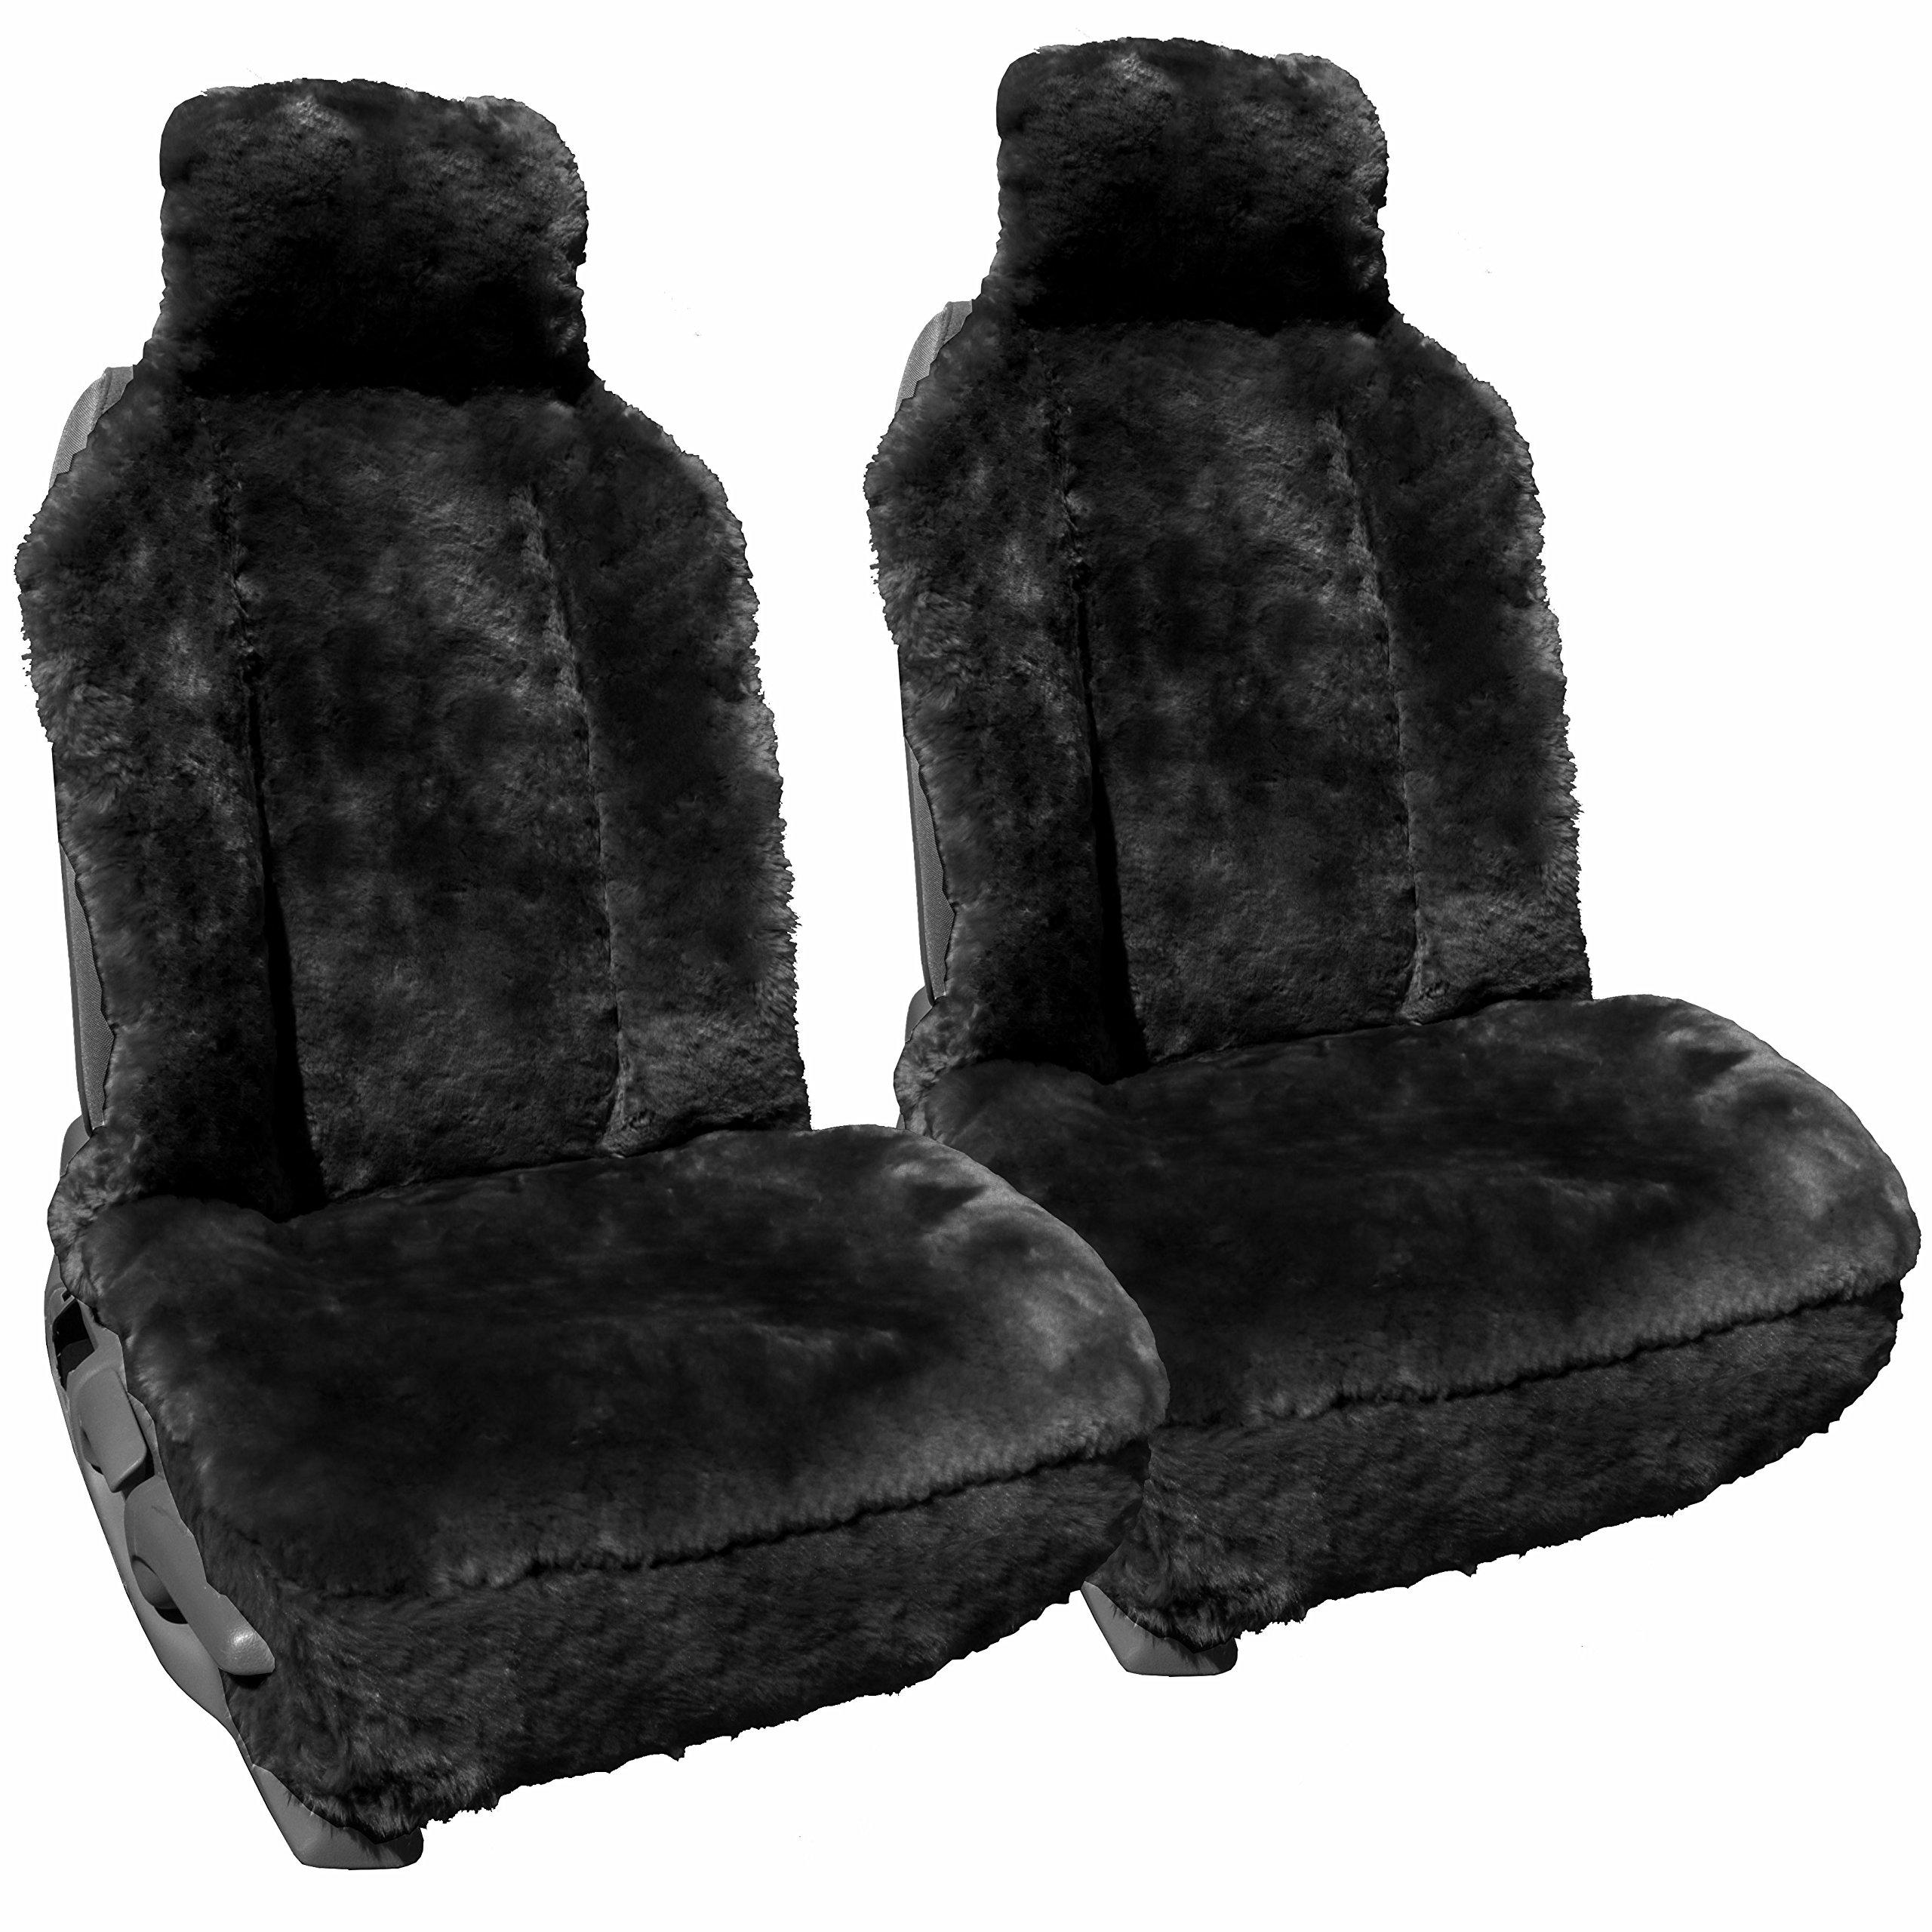 Genuine Sheepskin Car Seat Covers - Universal Seat Covers - Charcoal - 1 Pair (2 Seat Covers)